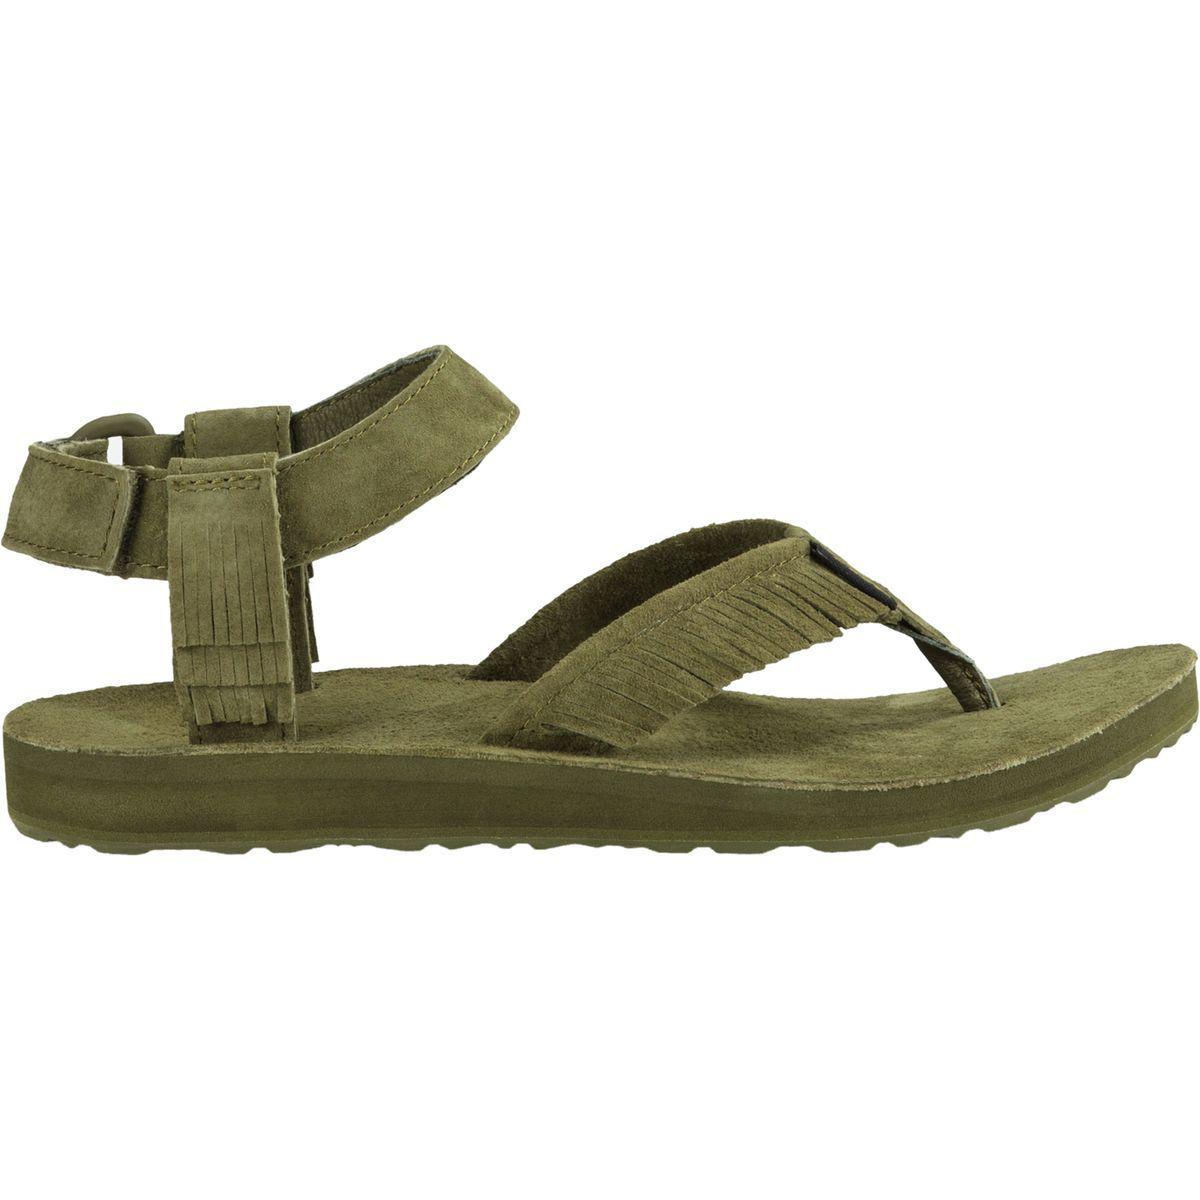 7e0096b75c23 Lyst - Teva Original Leather Fringe Flat Sandal in Green